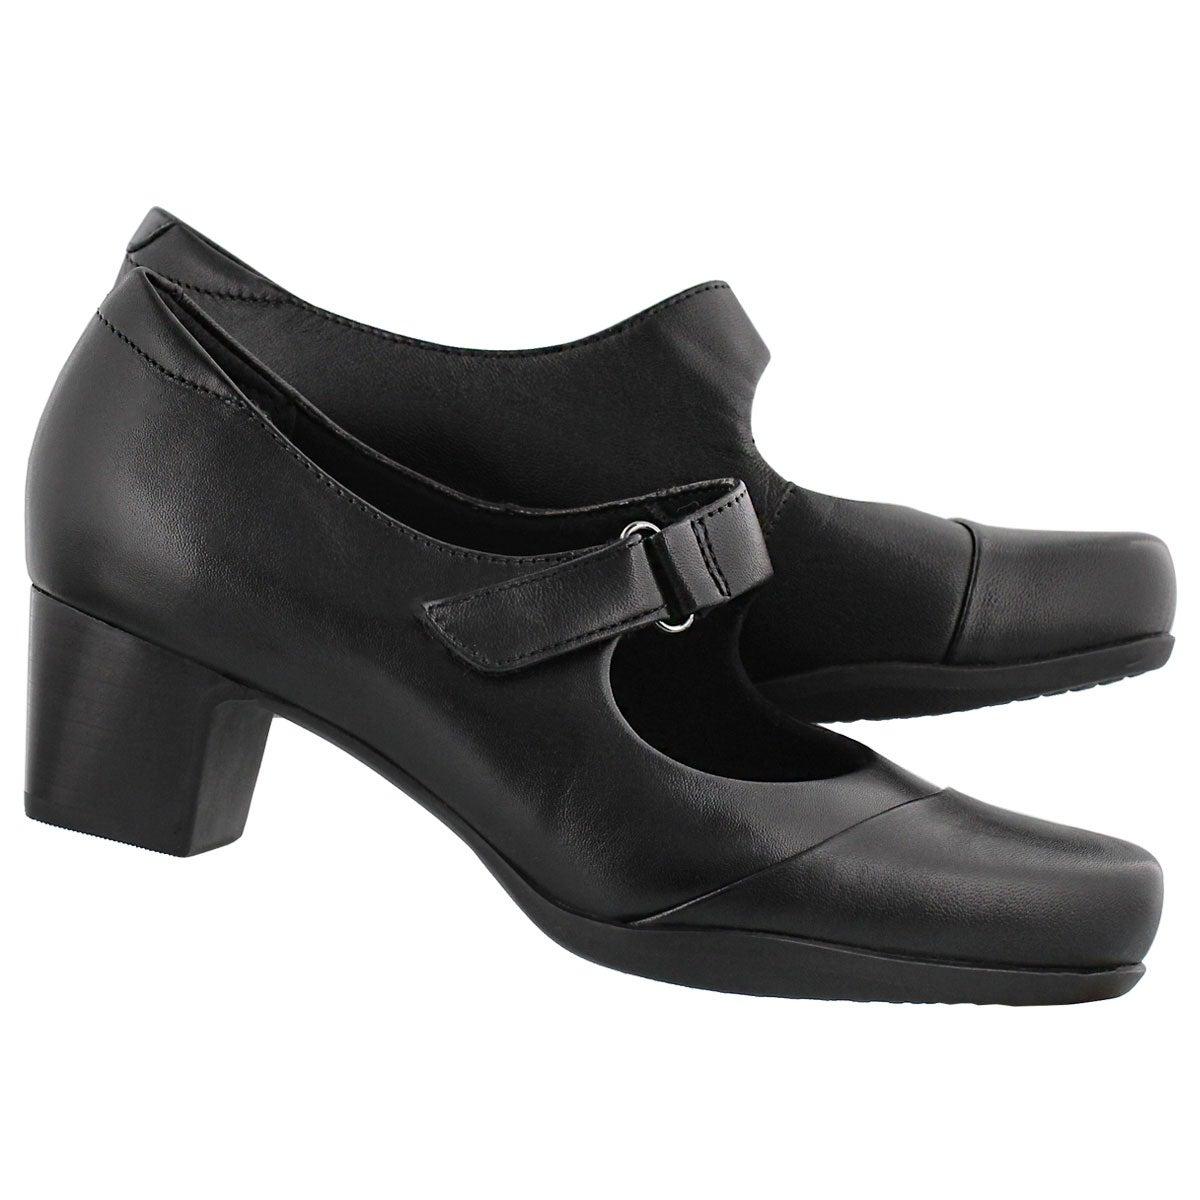 Lds Rosalyn Wren blk maryjane heel-WIDE